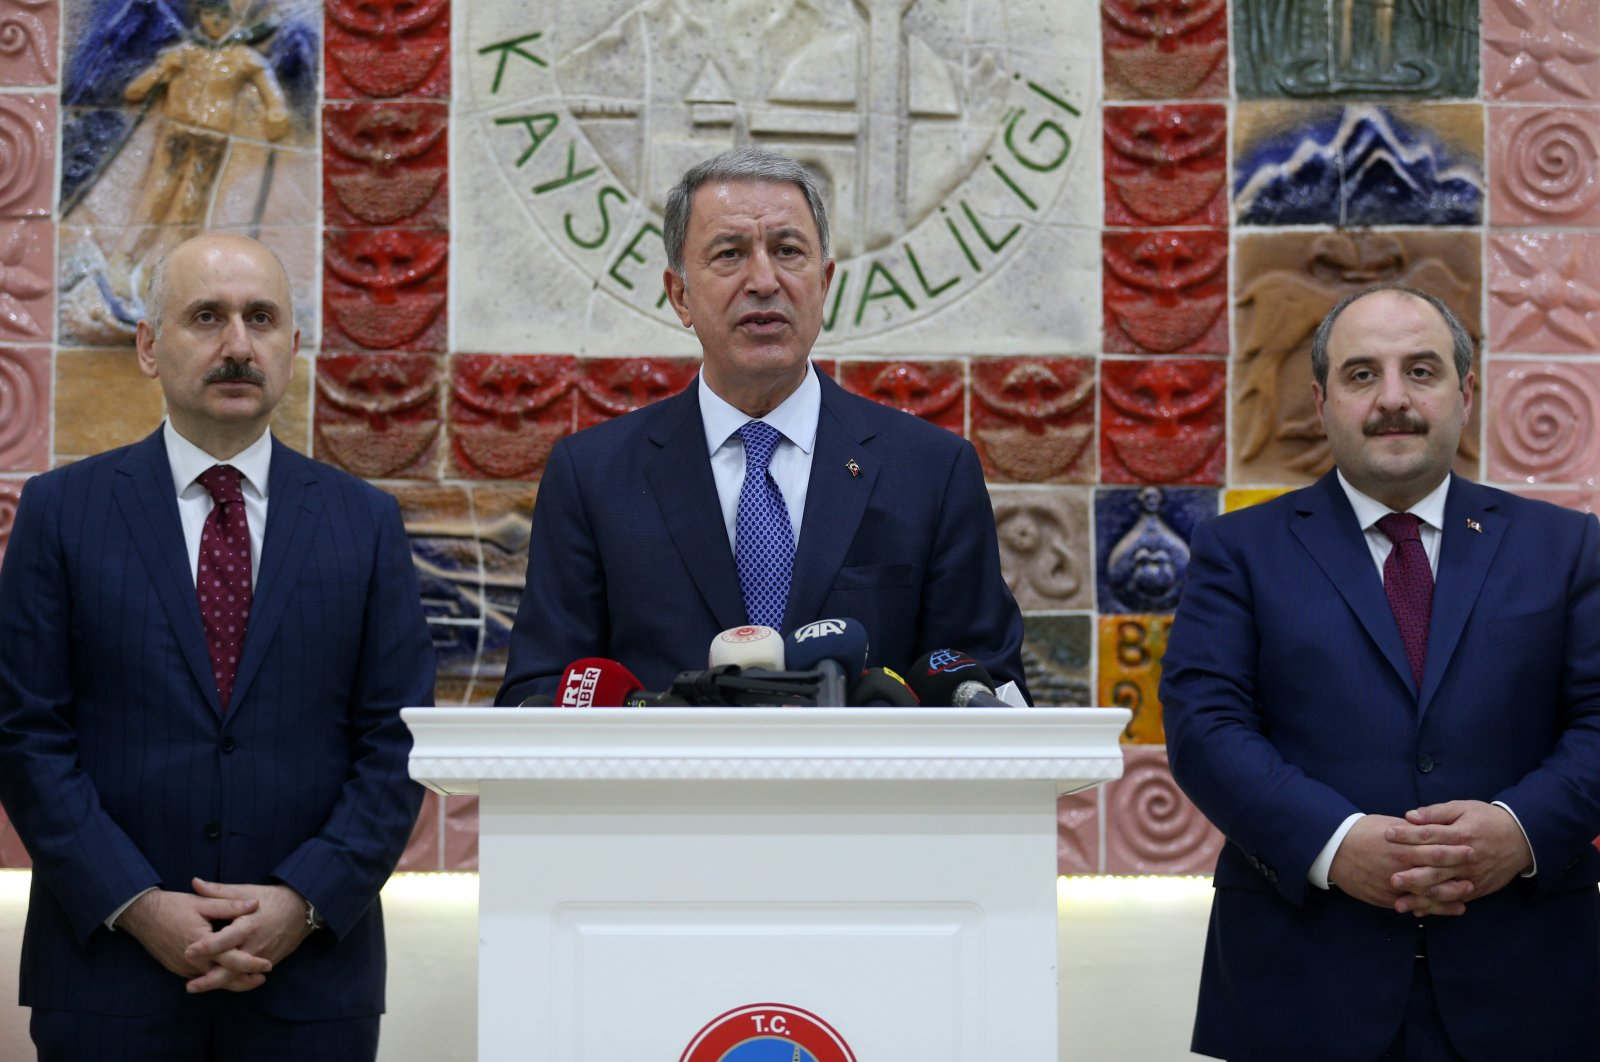 Defense Minister Hulusi Akar (C) speaks at the Kayseri Governor's Office with Industry and Technology Minister Mustafa Varank (R) and Transportation Minister Adil Karaismailoğlu (L), June 25, 2020. (AA Photo)